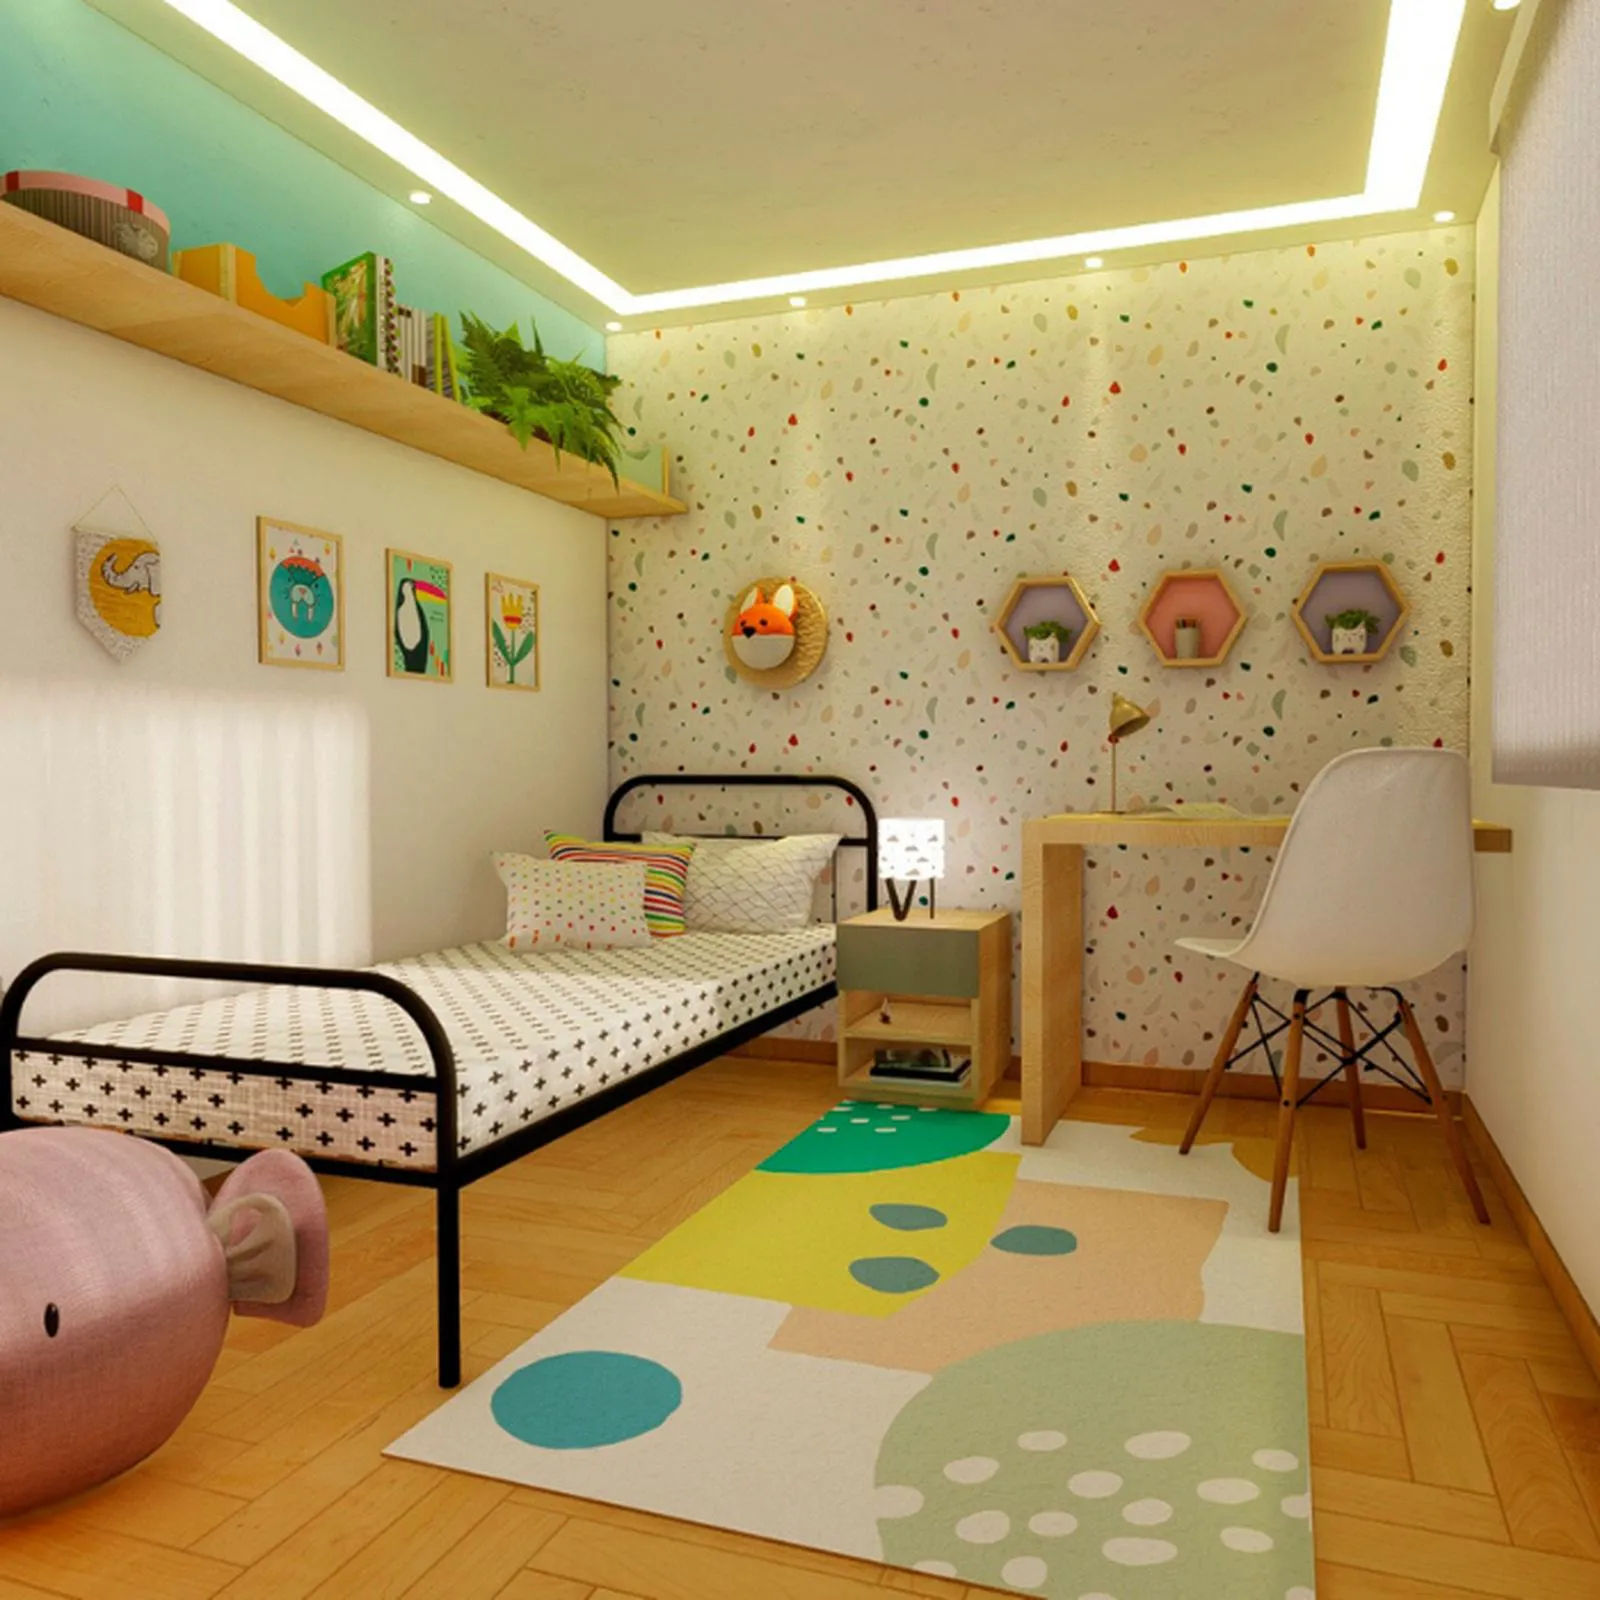 Tapete quarto infantil 100 x 150 cm estampa Natureza